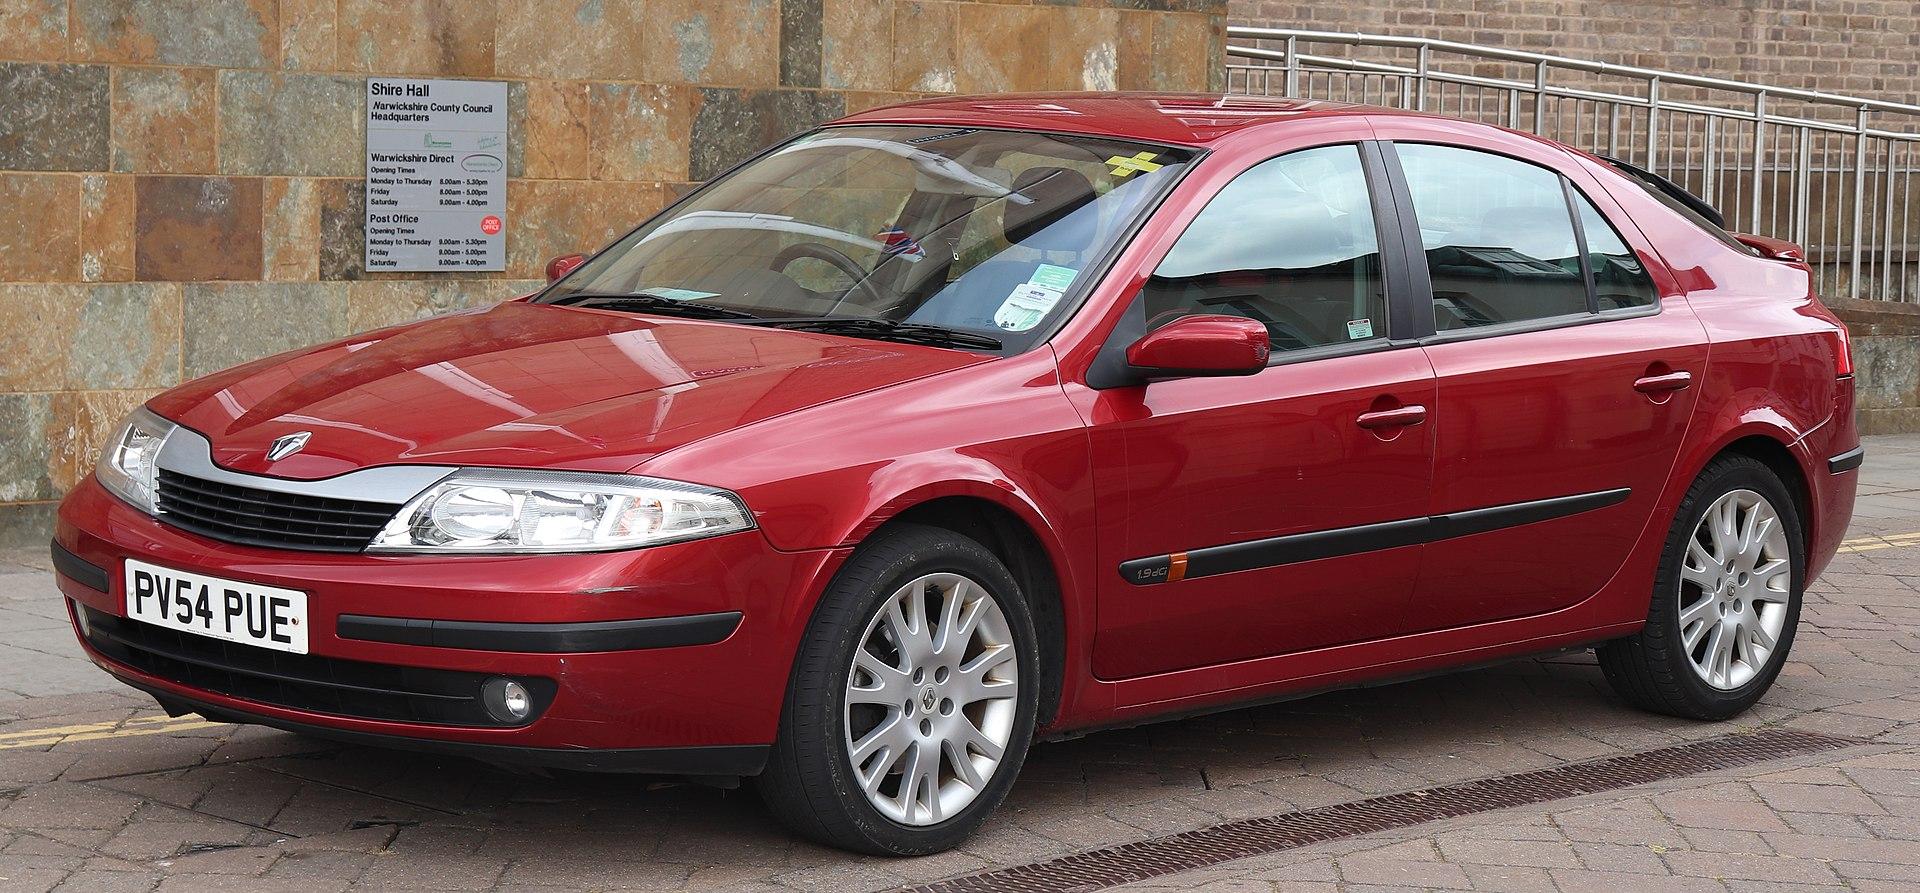 2005 Renault Laguna Dynamique DCi 120 1.9 Front.jpg